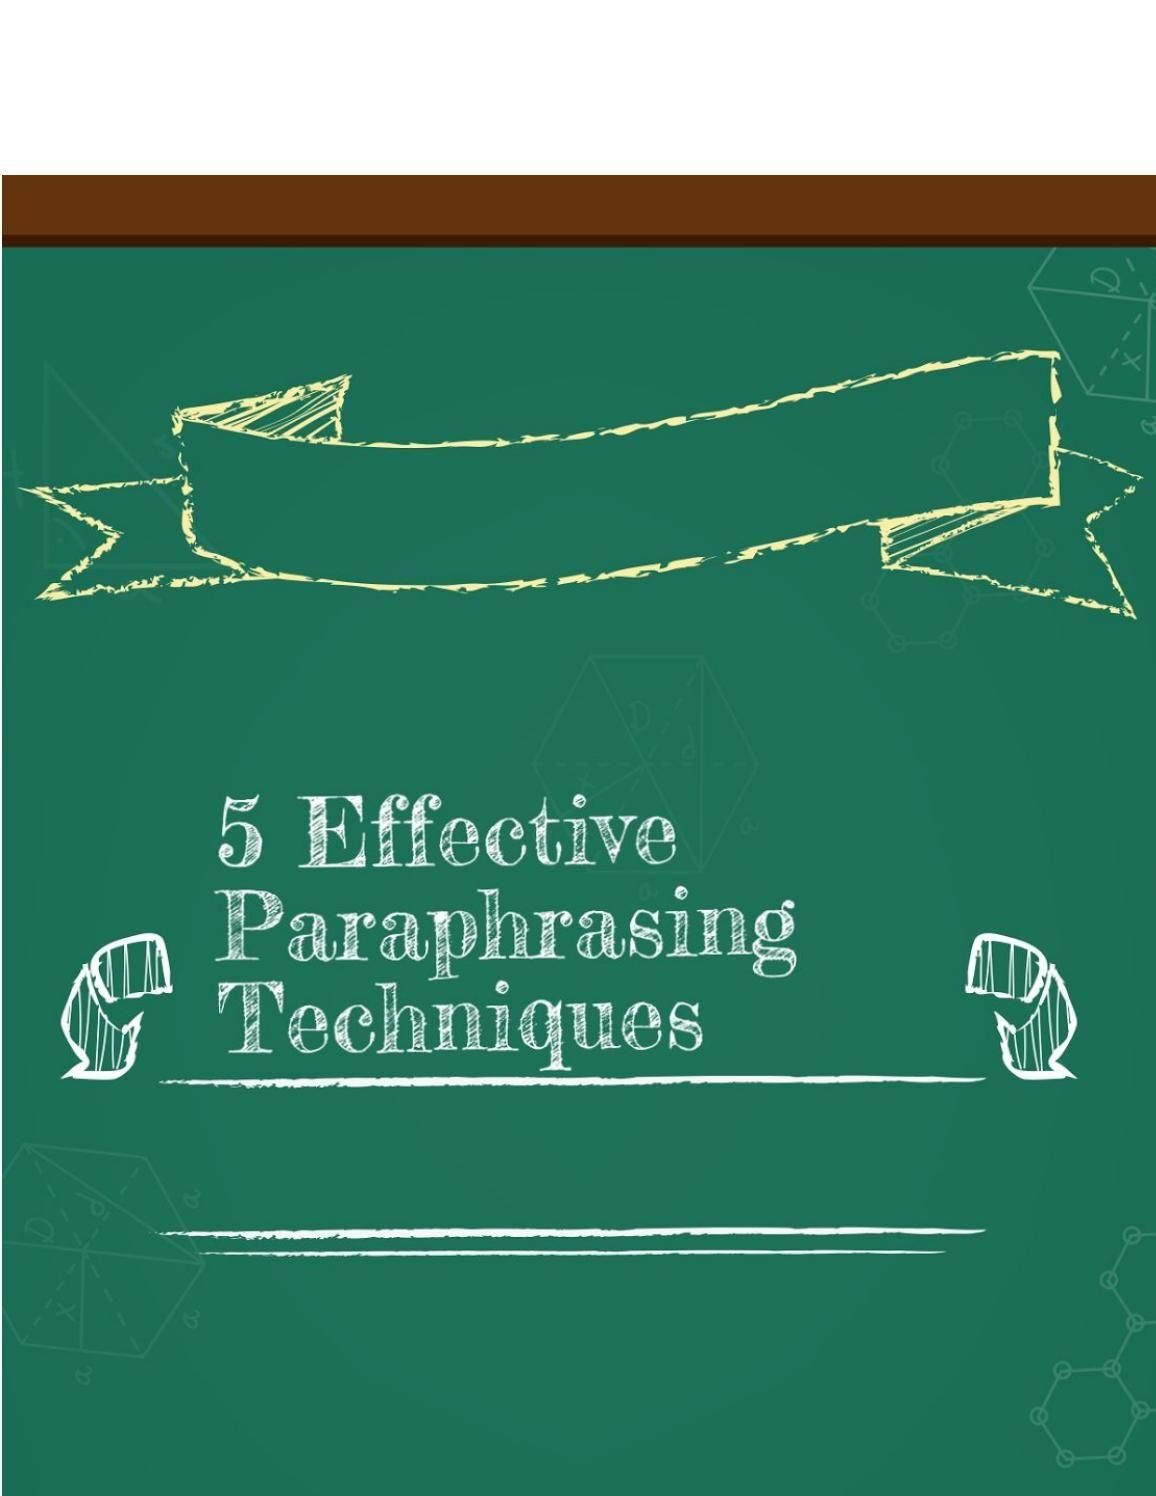 Image Result For Paraphrasing Versu Parroting Call Center Paraphrase Techniques